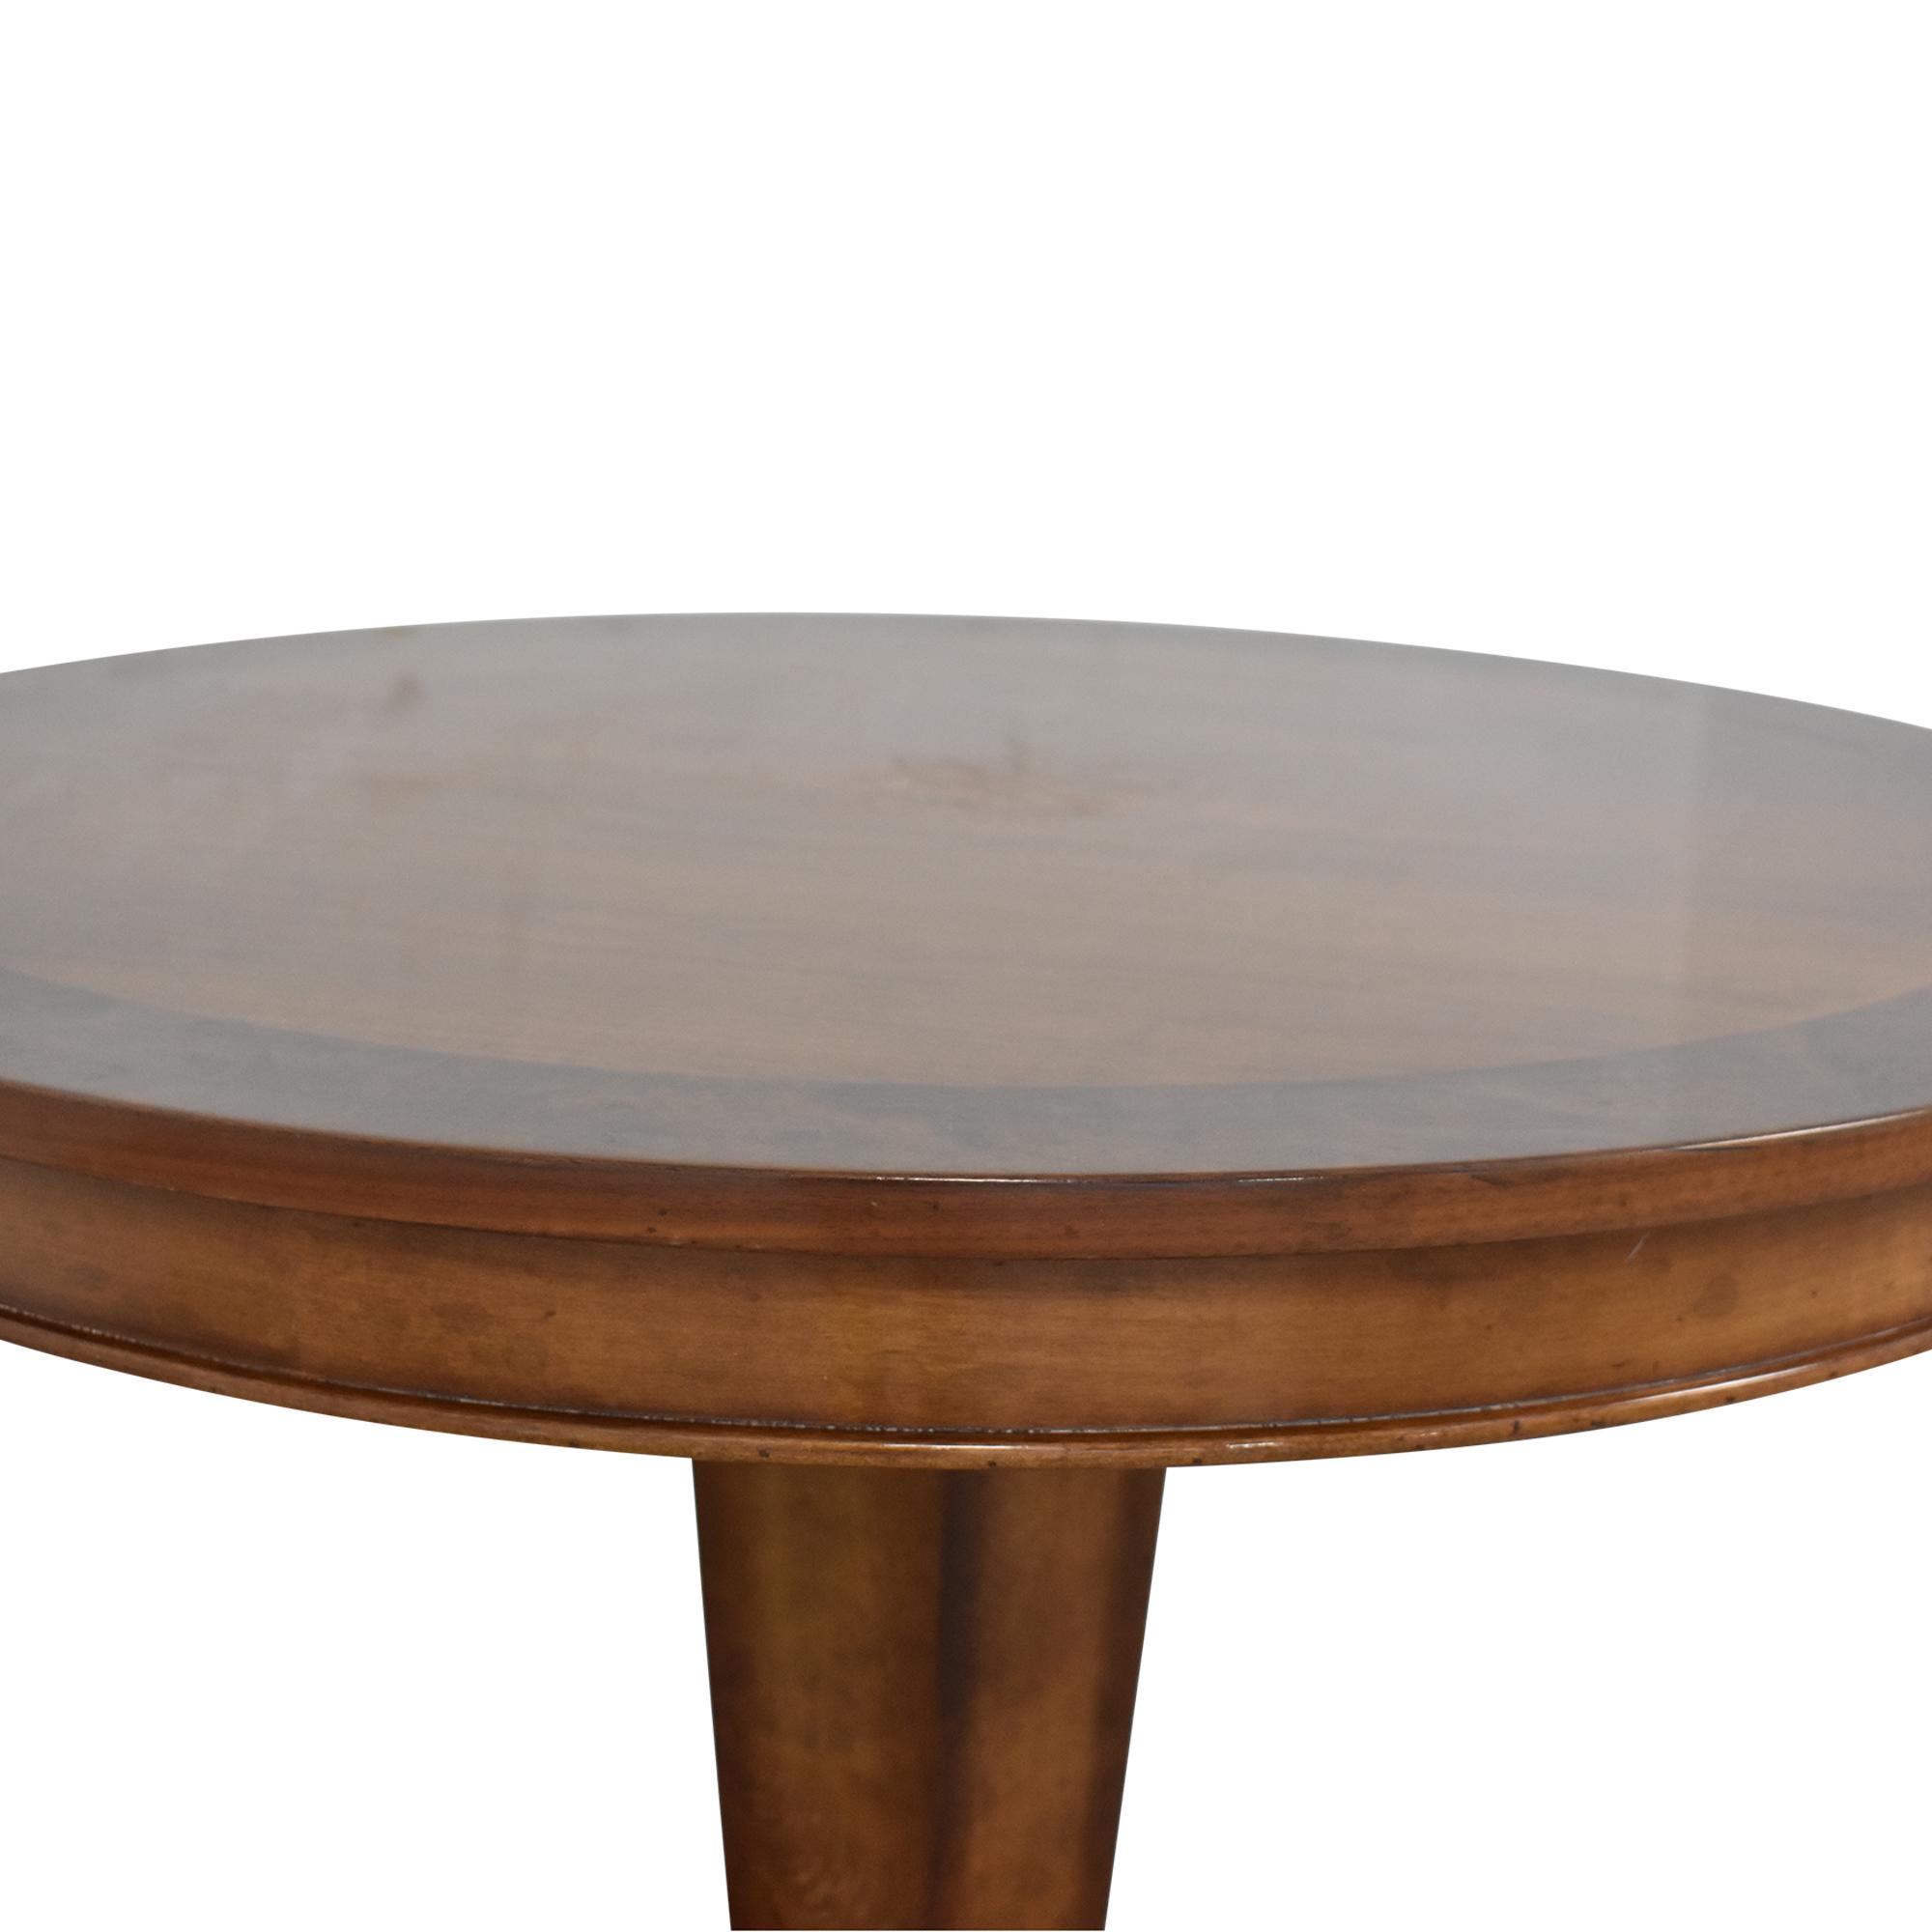 Baker Furniture Milling Road Pedestal Table / Accent Tables